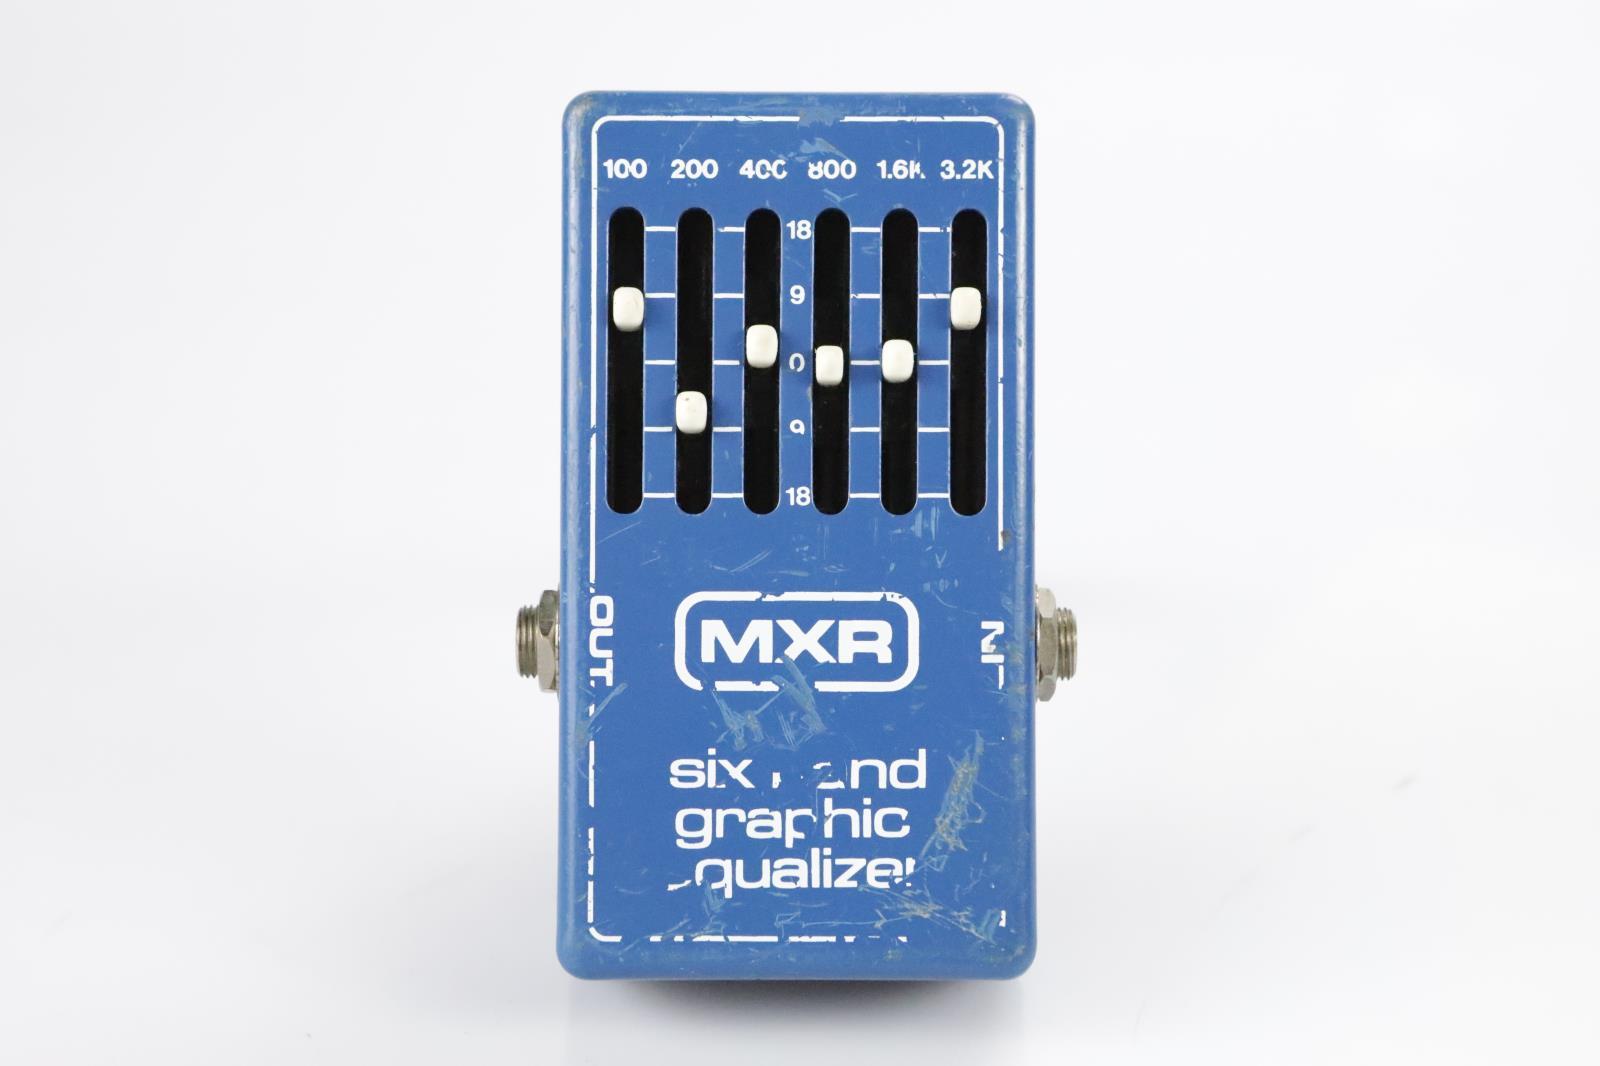 MXR Six Band Graphic Equalizer Pedal Blue Bruce Kulick Kiss #34405